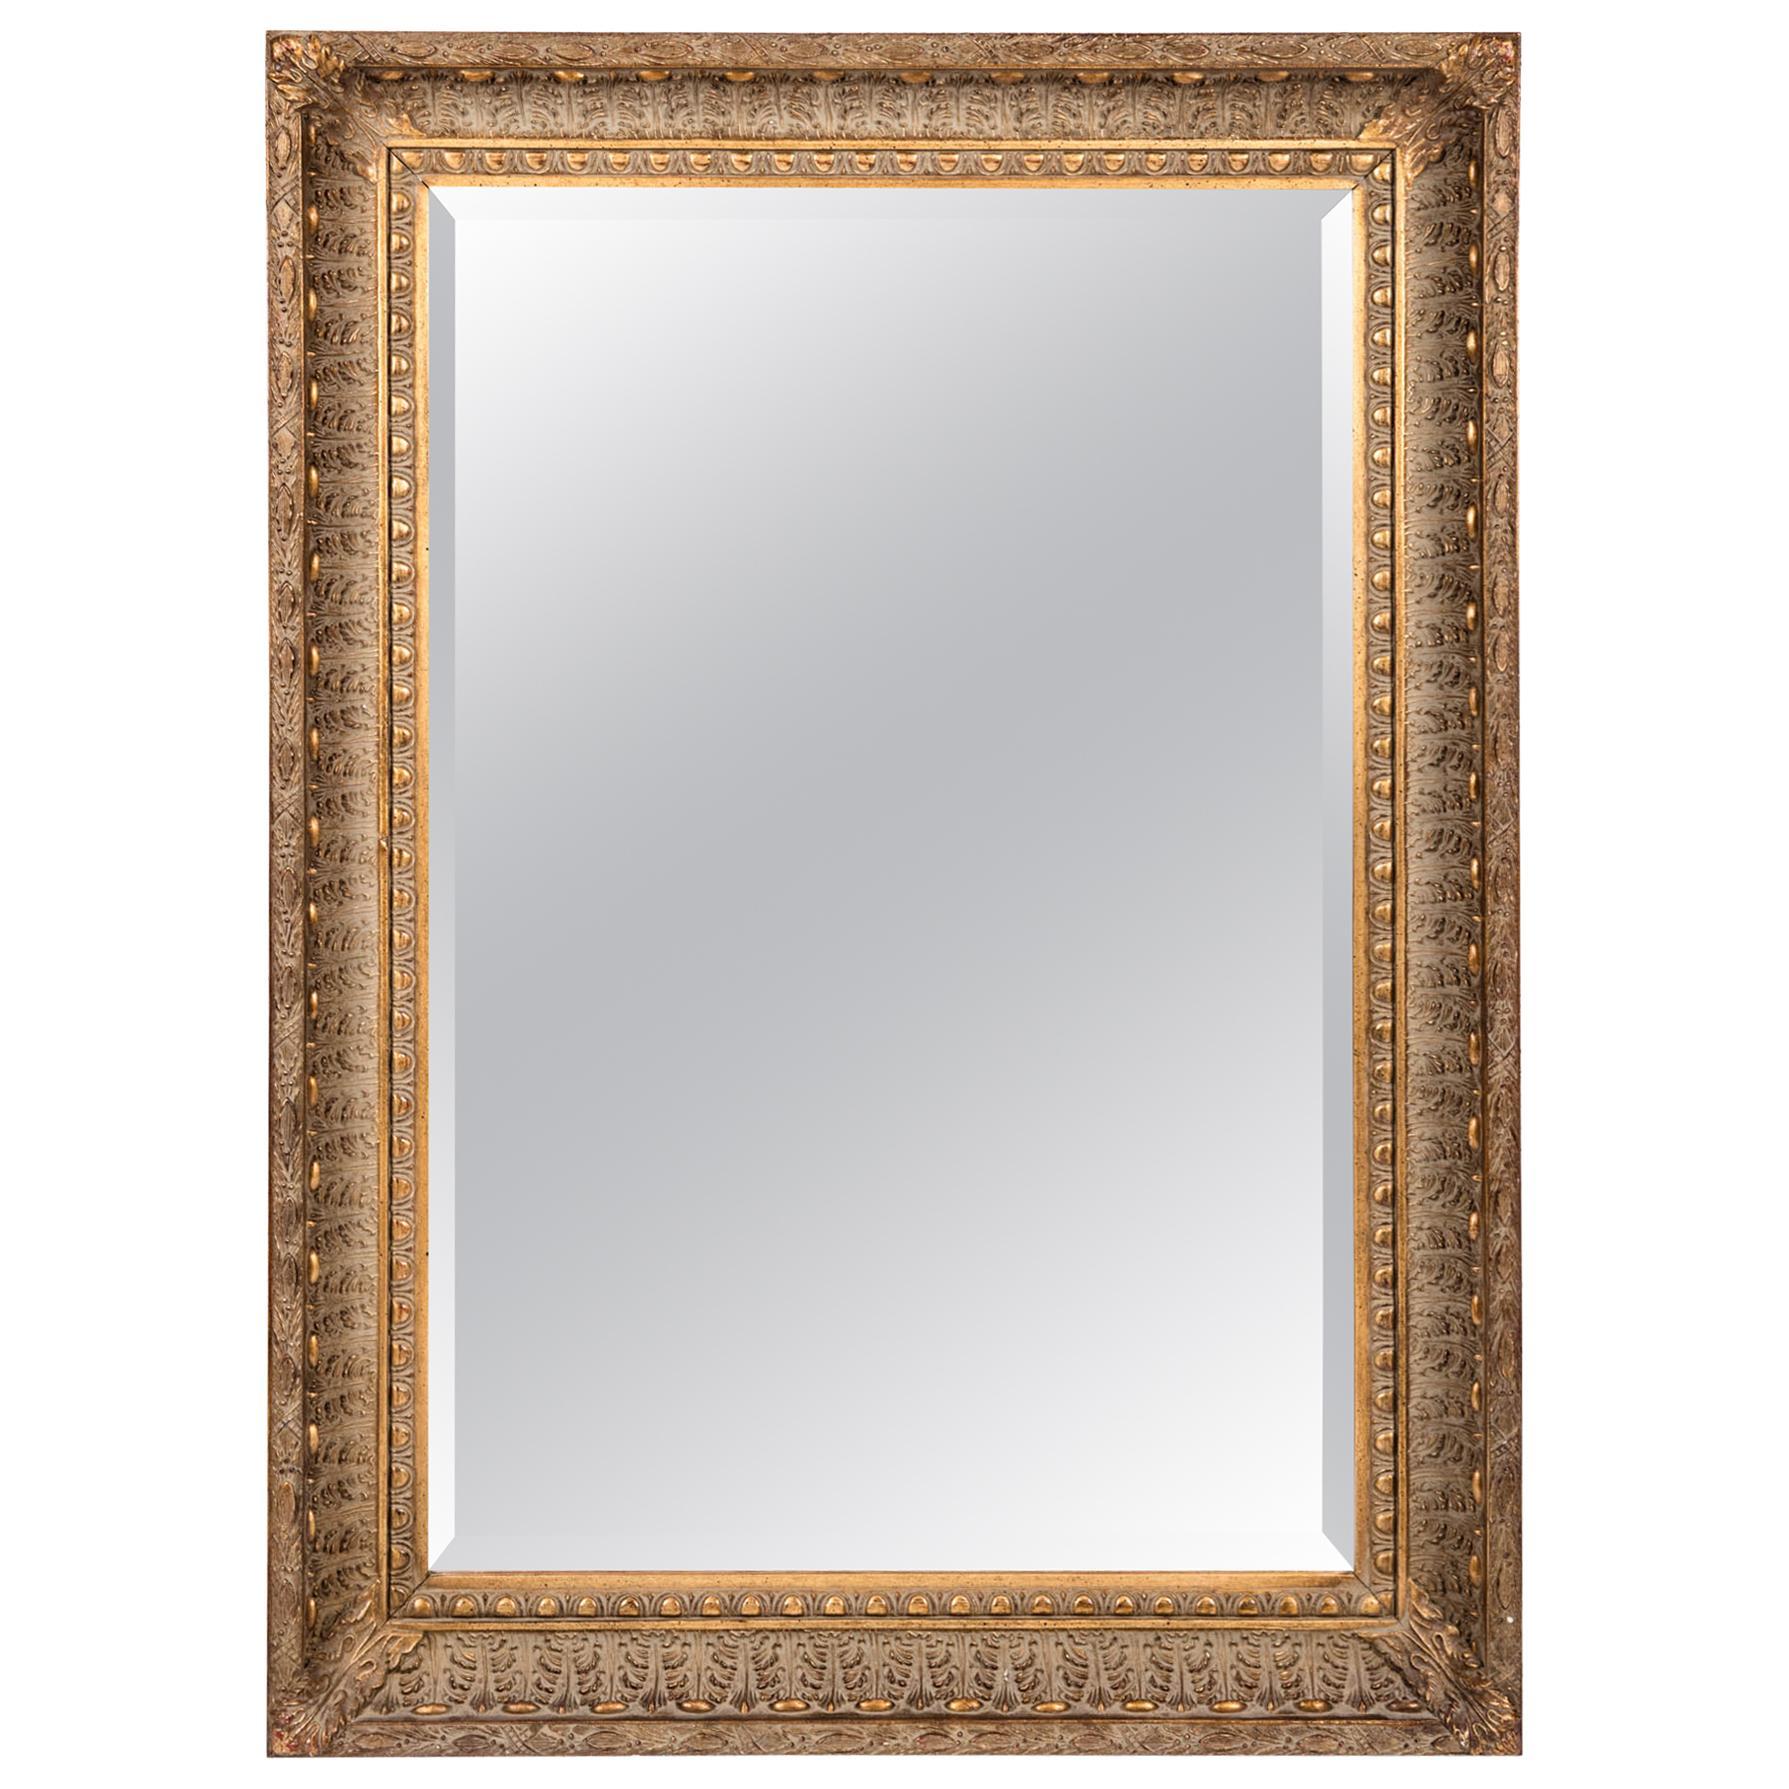 Giltwood Framed Beveled Hanging Wall Mirror